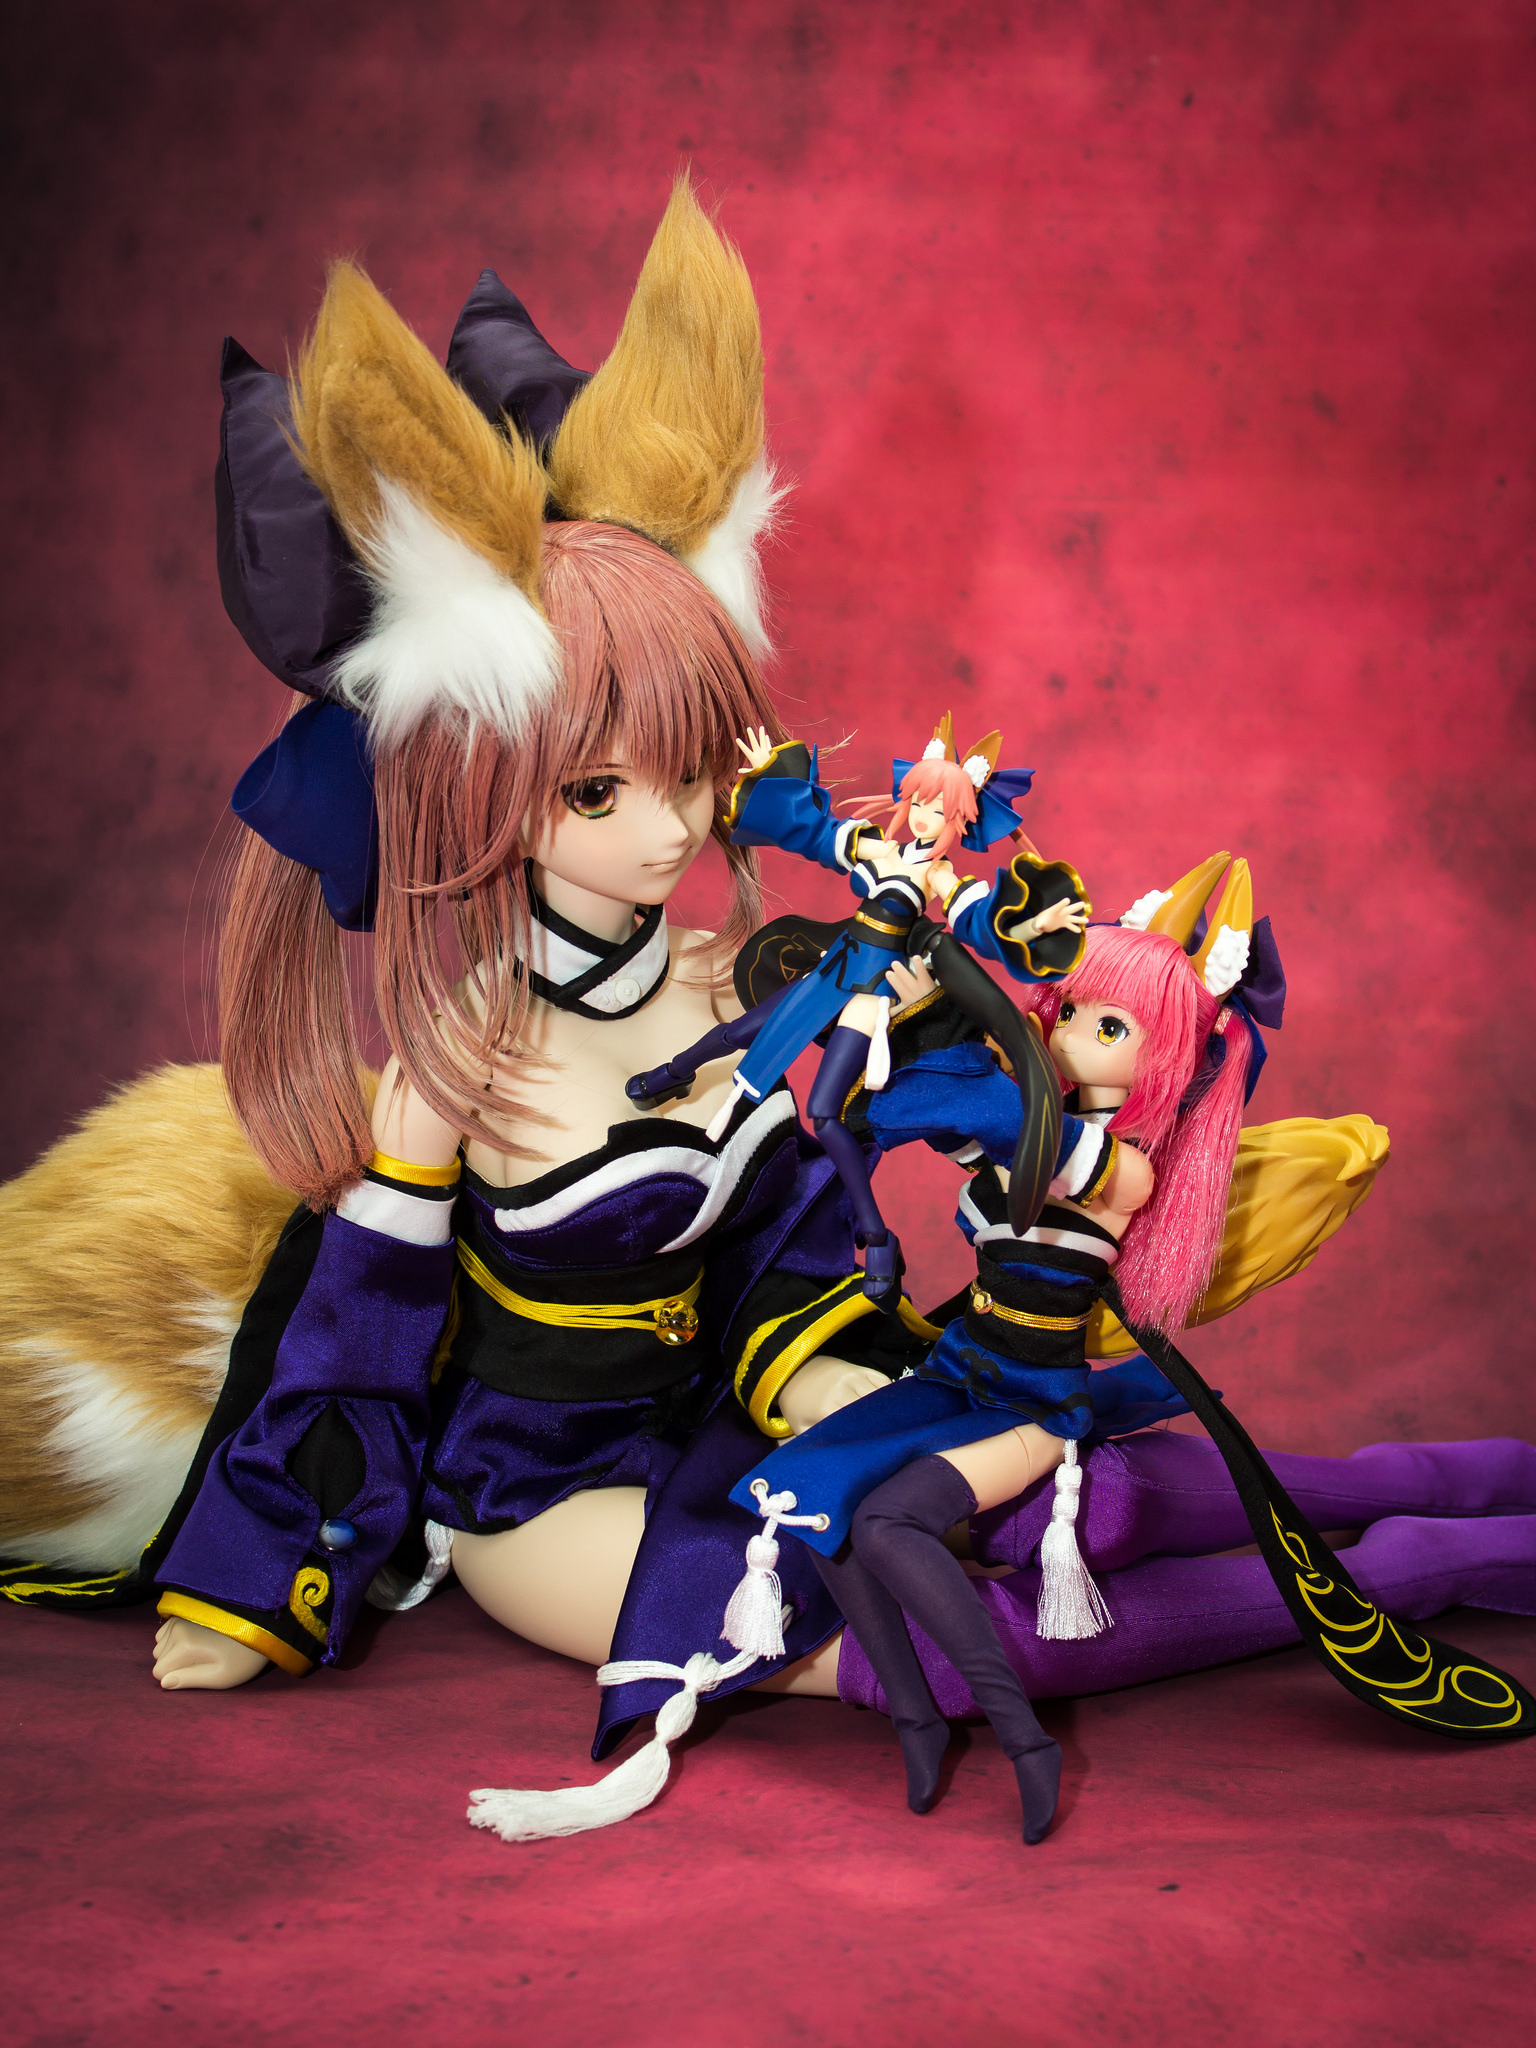 figma max_factory type_moon chizuru hobby_japan azone kuroda_masanori pureneemo pureneemo_characters asai_(apsy)_masaki fate/extra caster_extra marvelous_aql